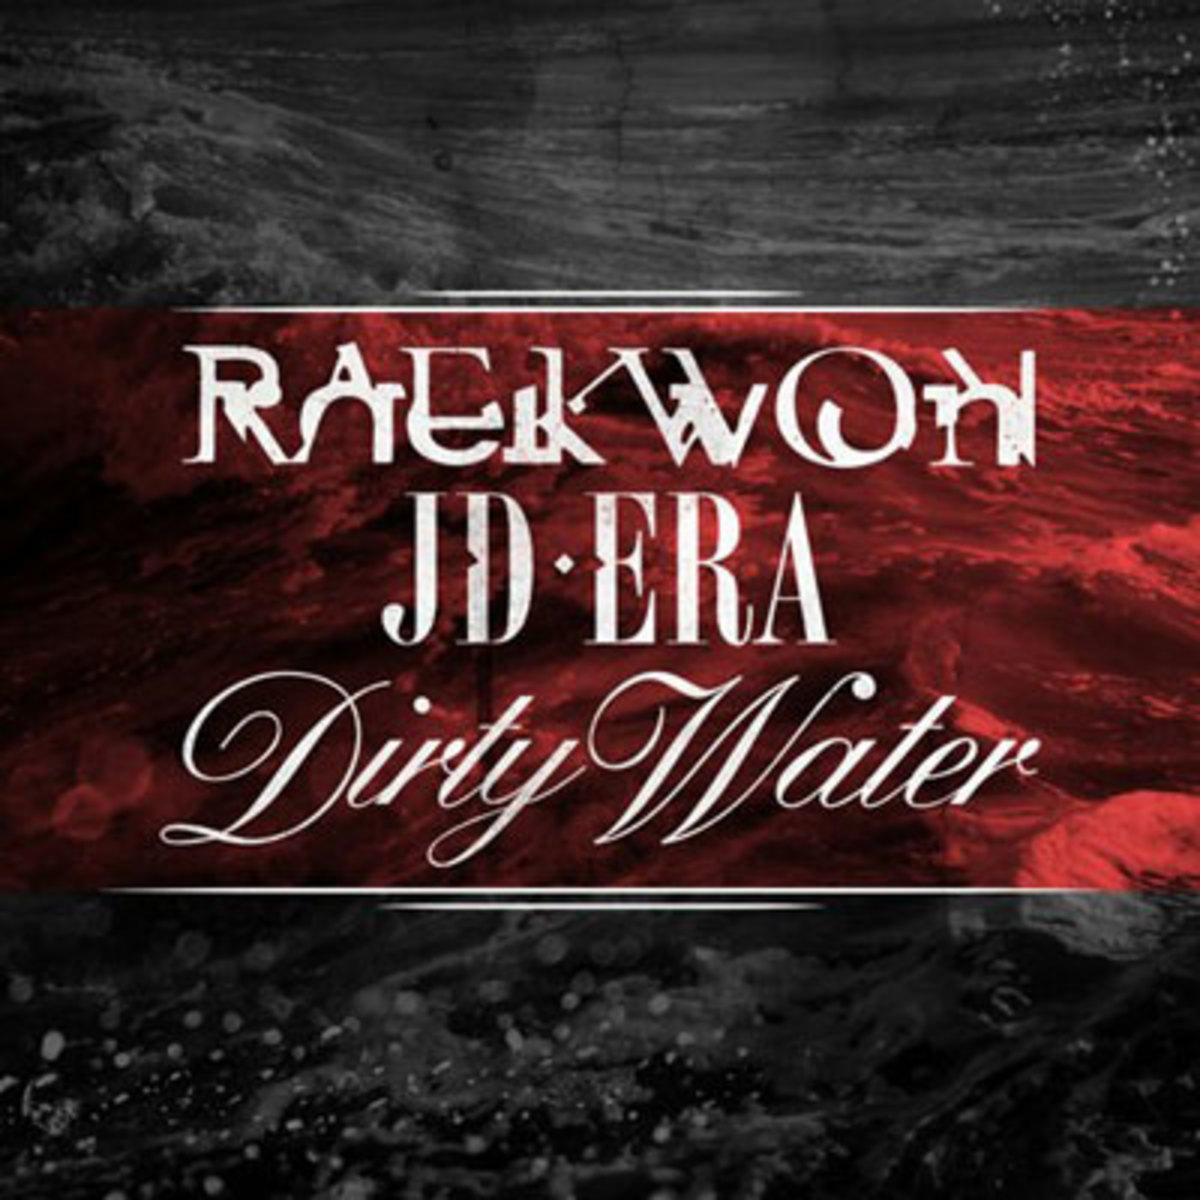 raekwon-dirtywater.jpg